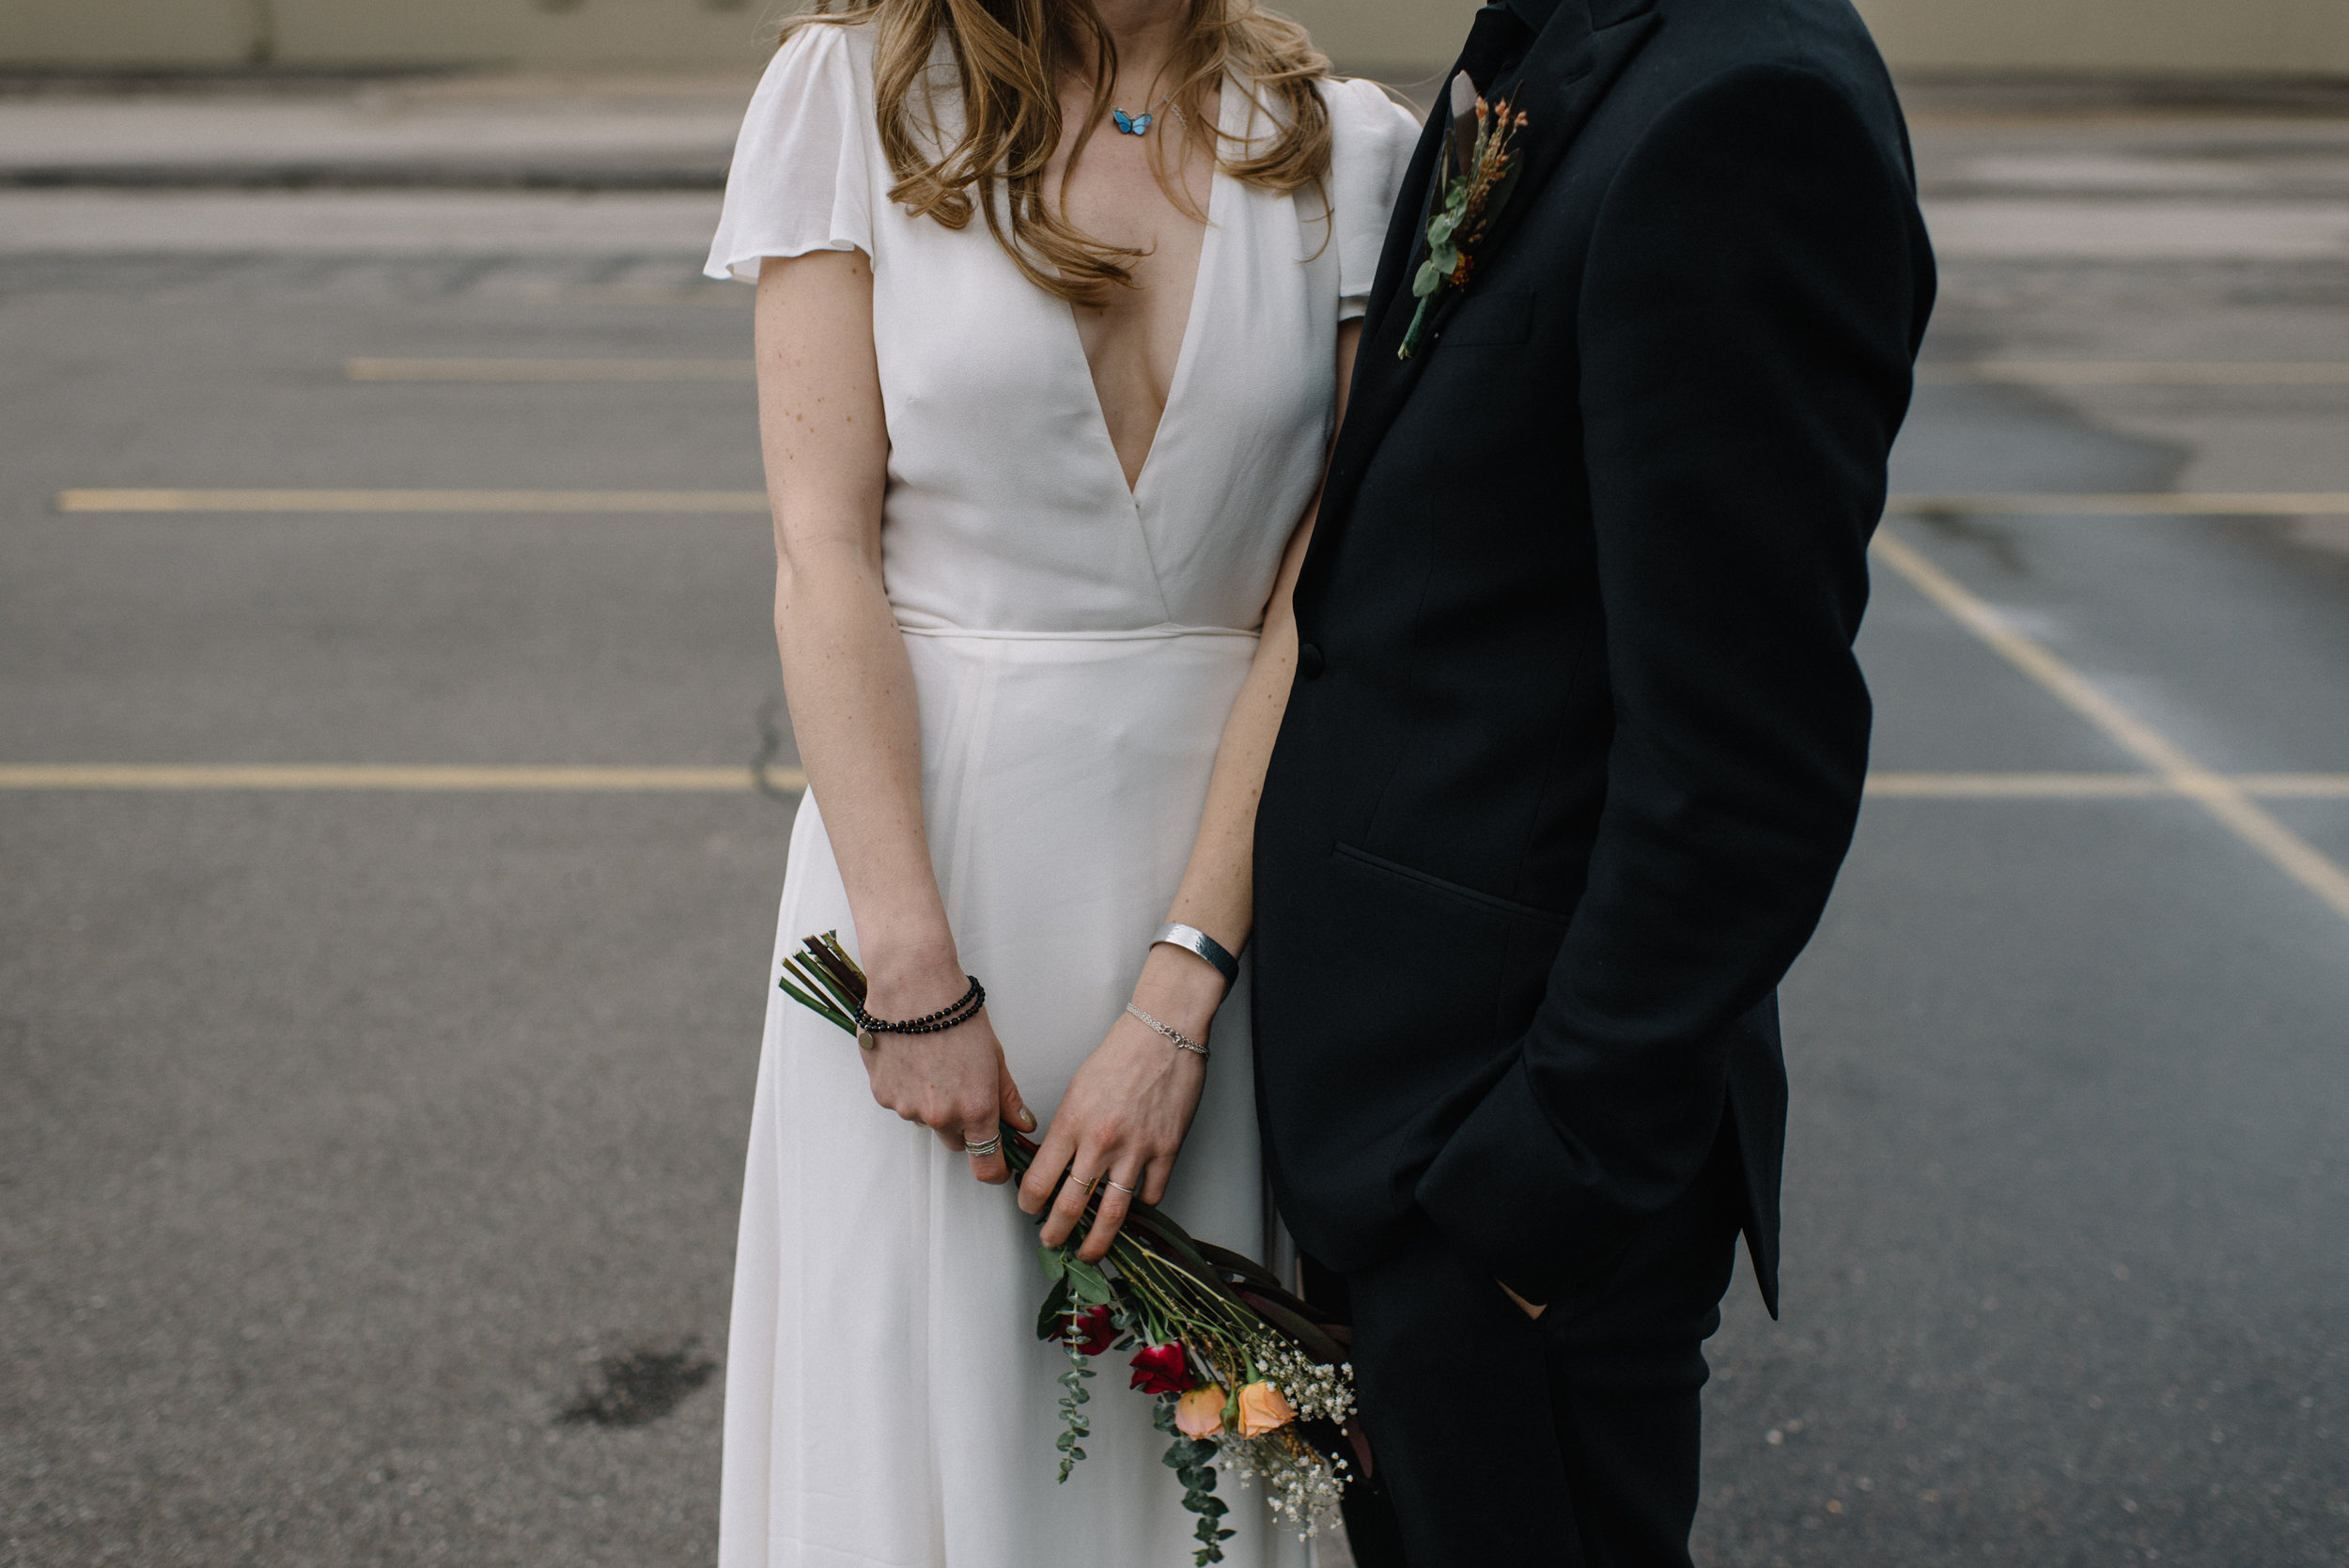 NOW BOOKING - WEDDINGS 2019/2020